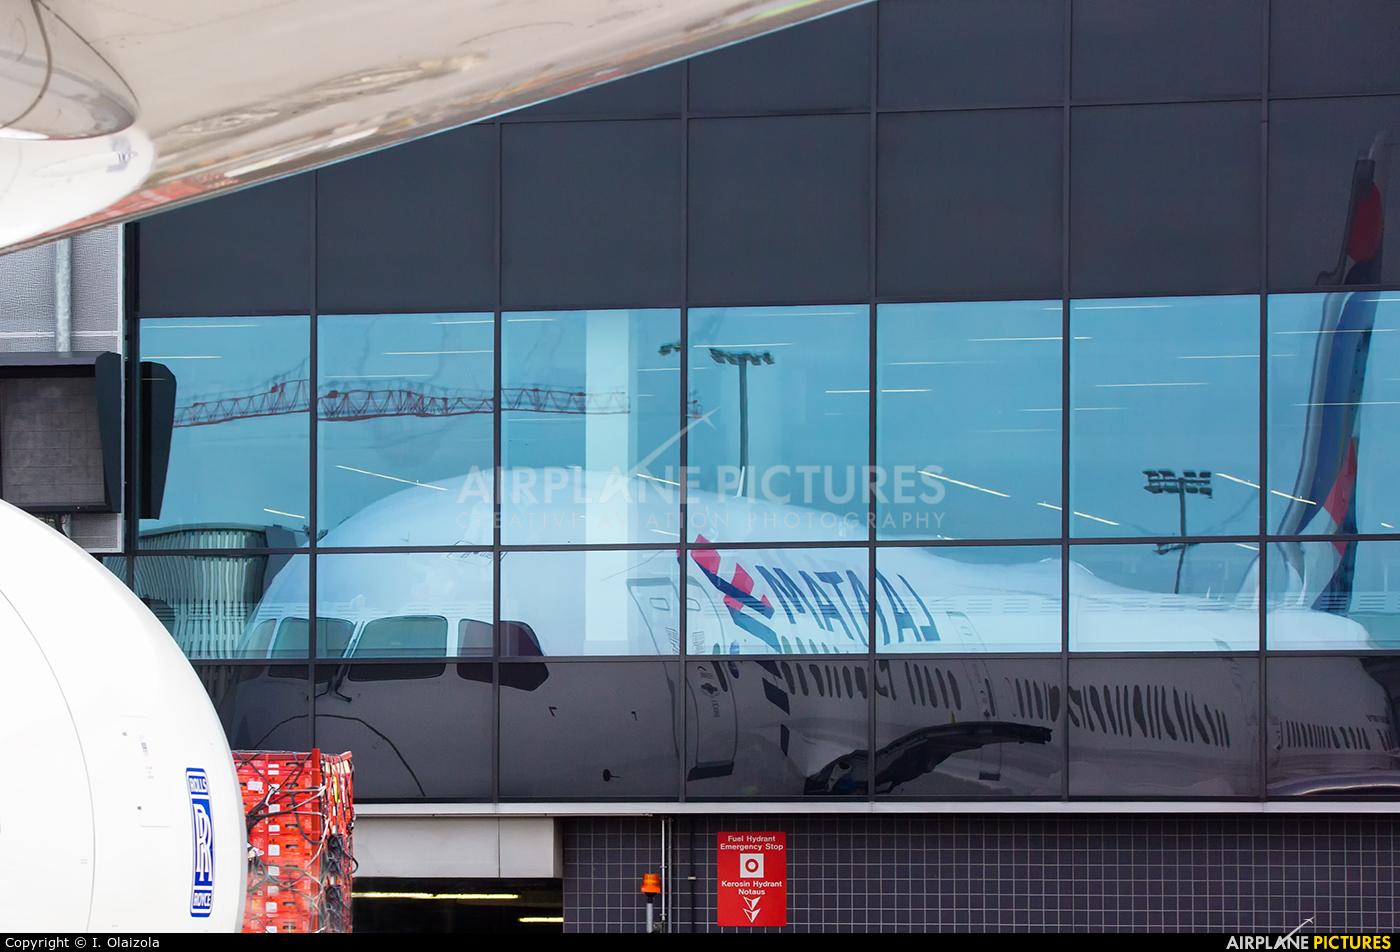 LATAM CC-BGL aircraft at Frankfurt